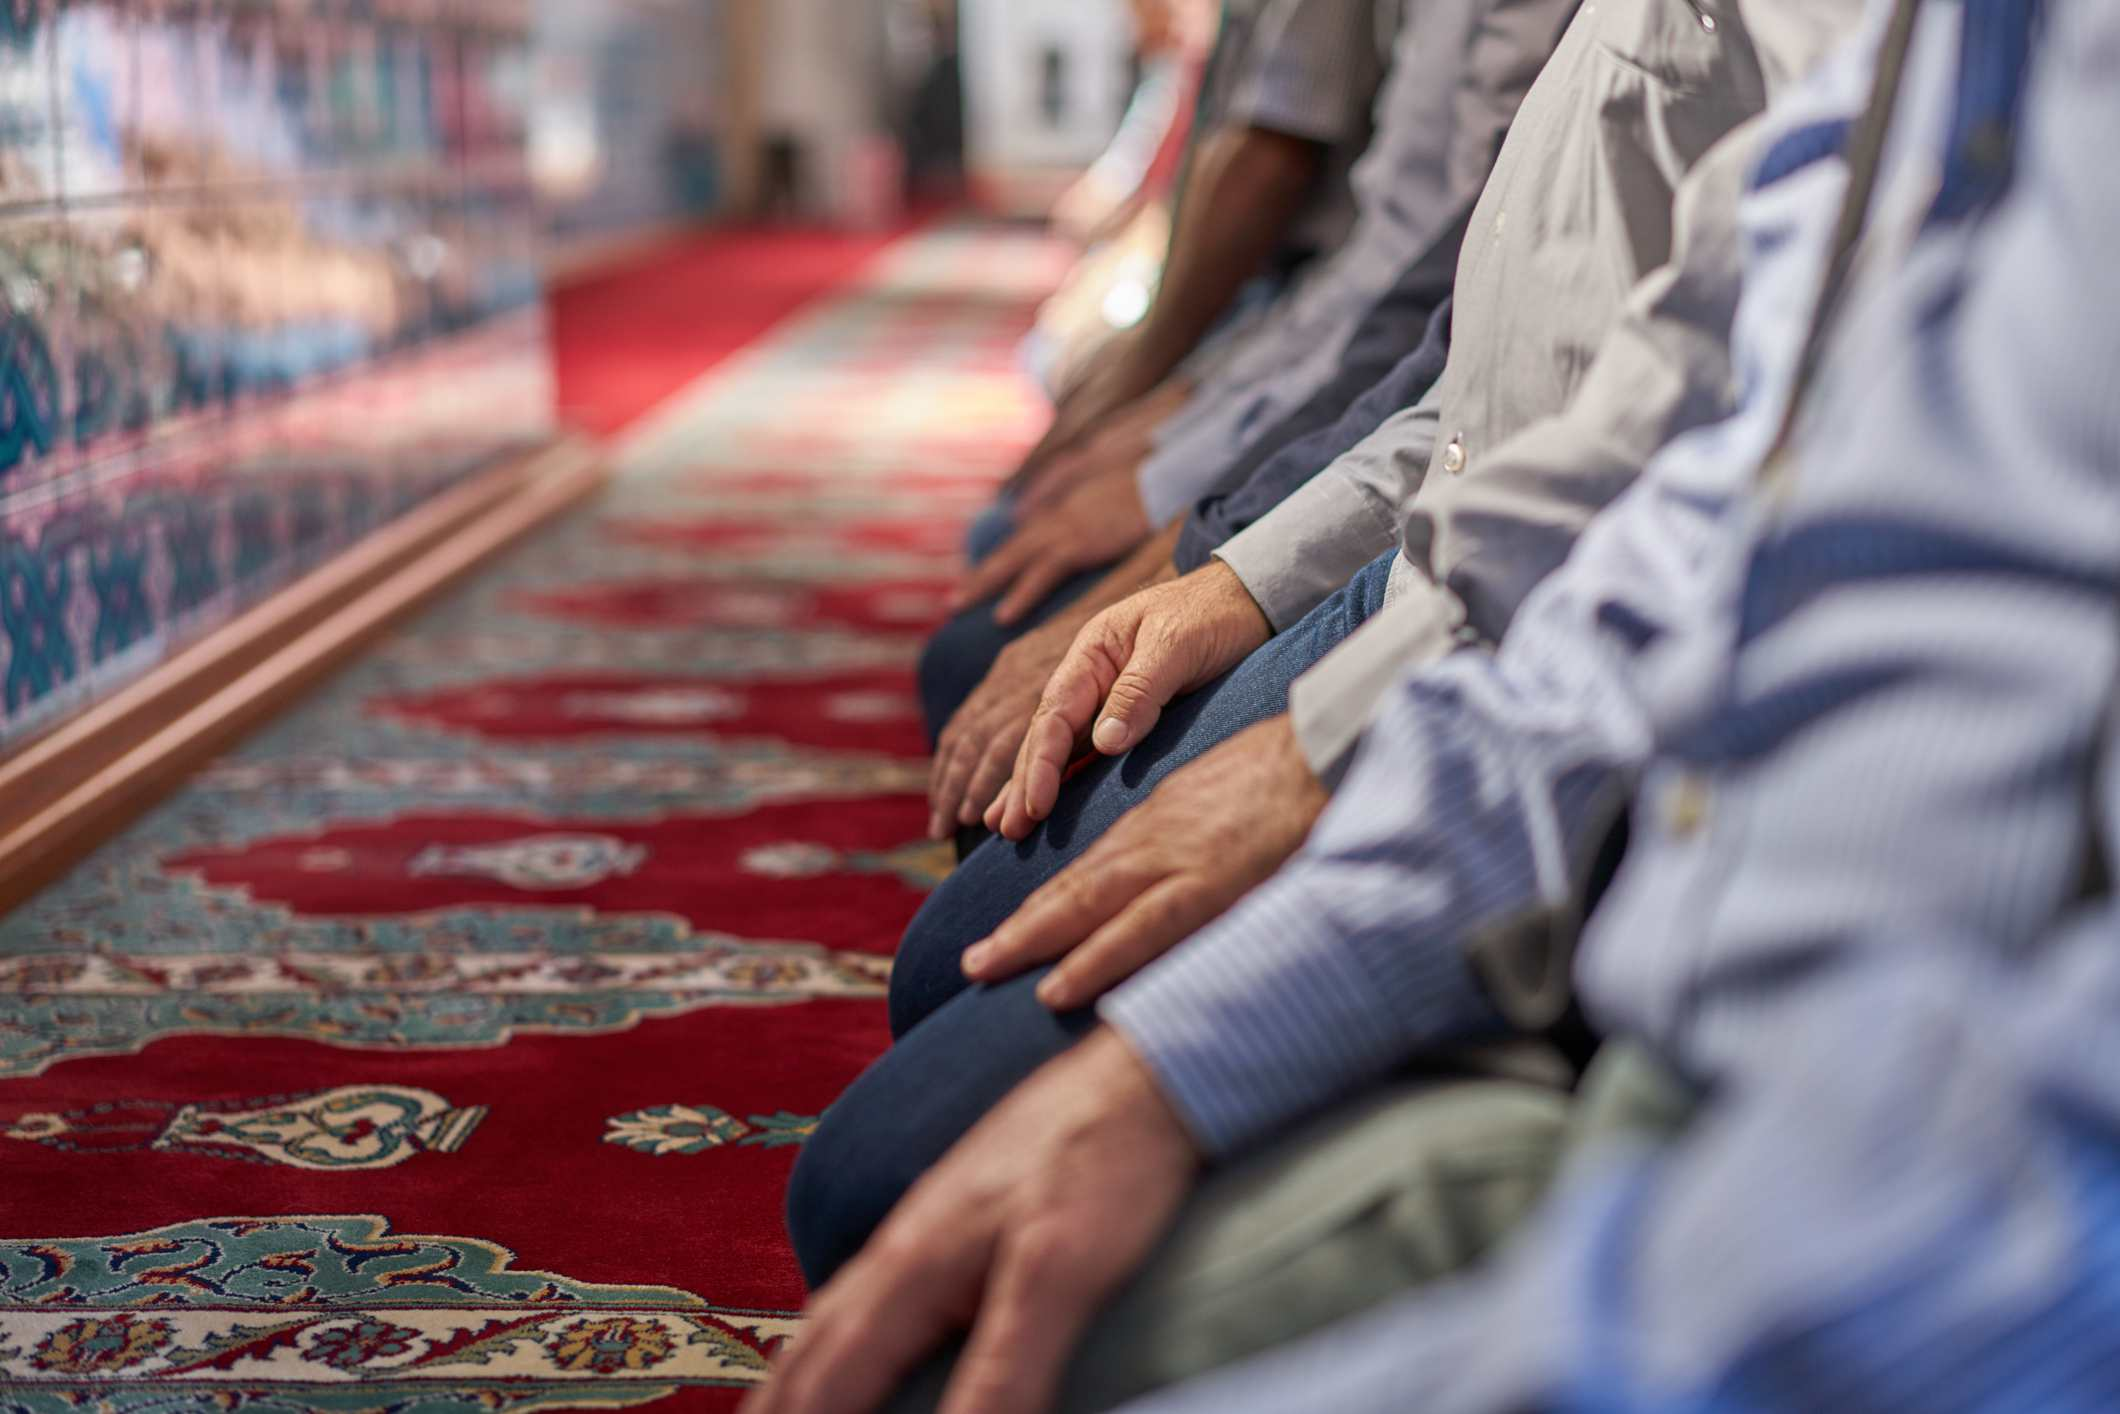 Etiquette For Non Muslims When Visiting A Mosque